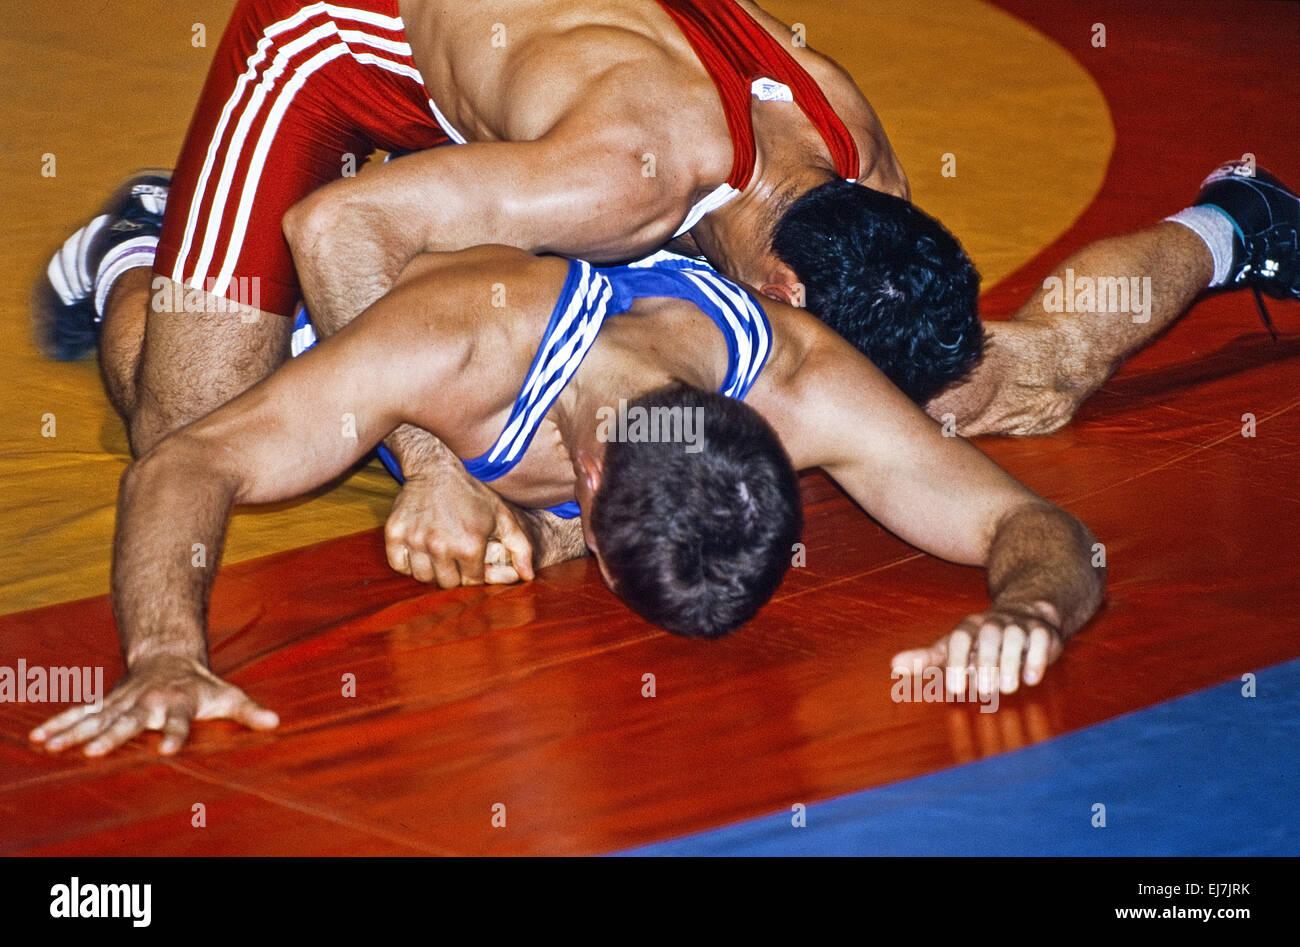 Il wrestling KSV Witten 07, Witten, Germania Immagini Stock